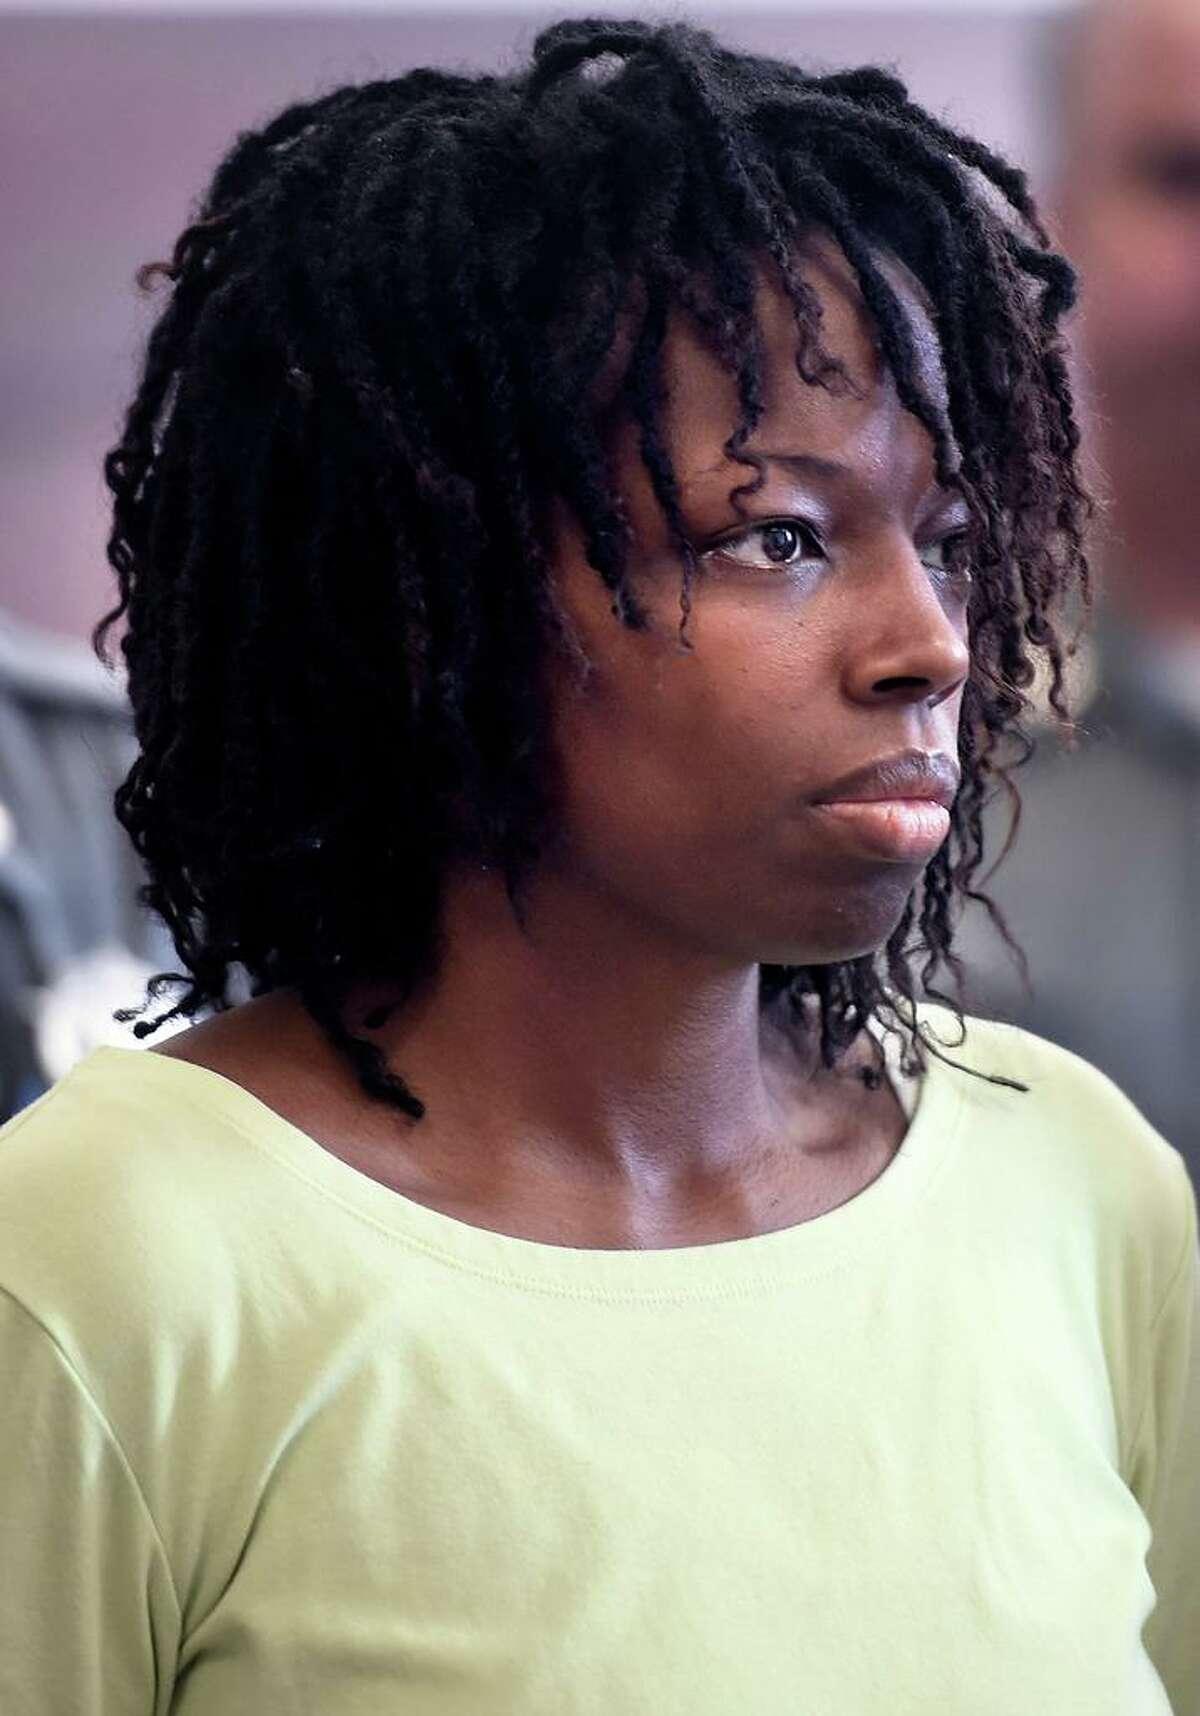 LeRoya Moore of East Haven is arraigned in Superior Court in New Haven in June 2015.